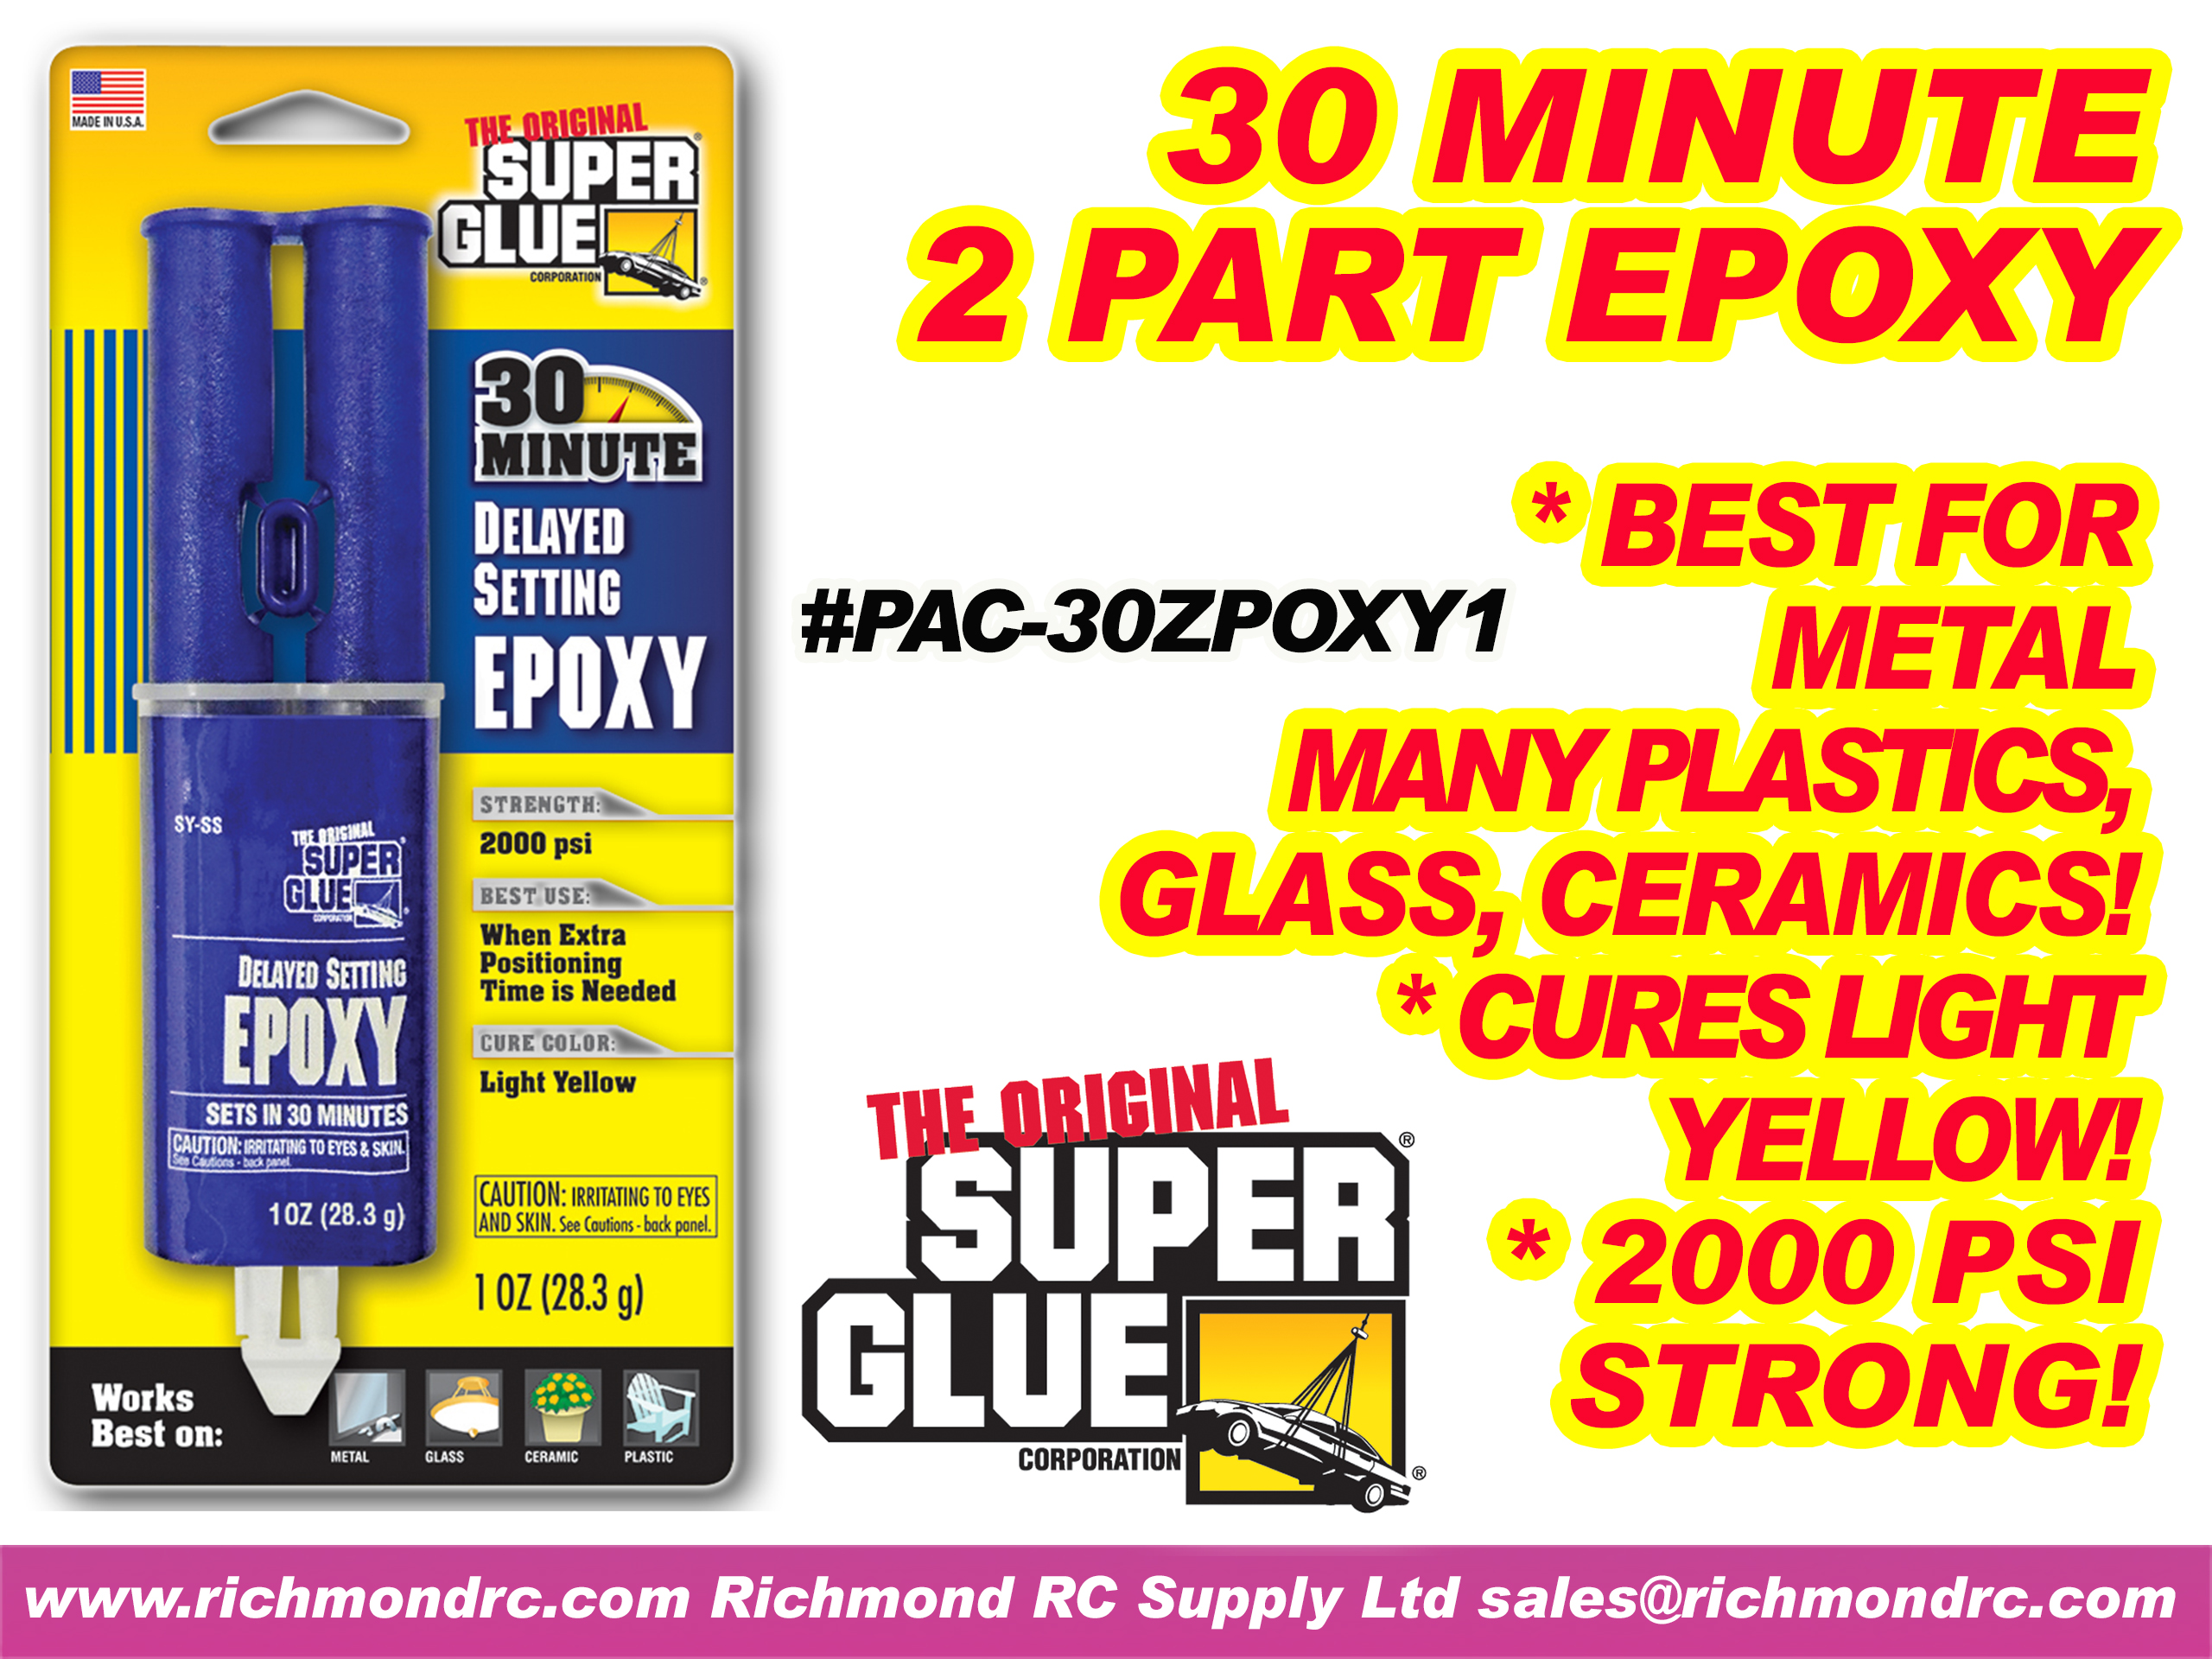 PAC-30ZPOXY1_Epoxy-30minute_1oz_Syringe_20210425_1257_stickerpix_active